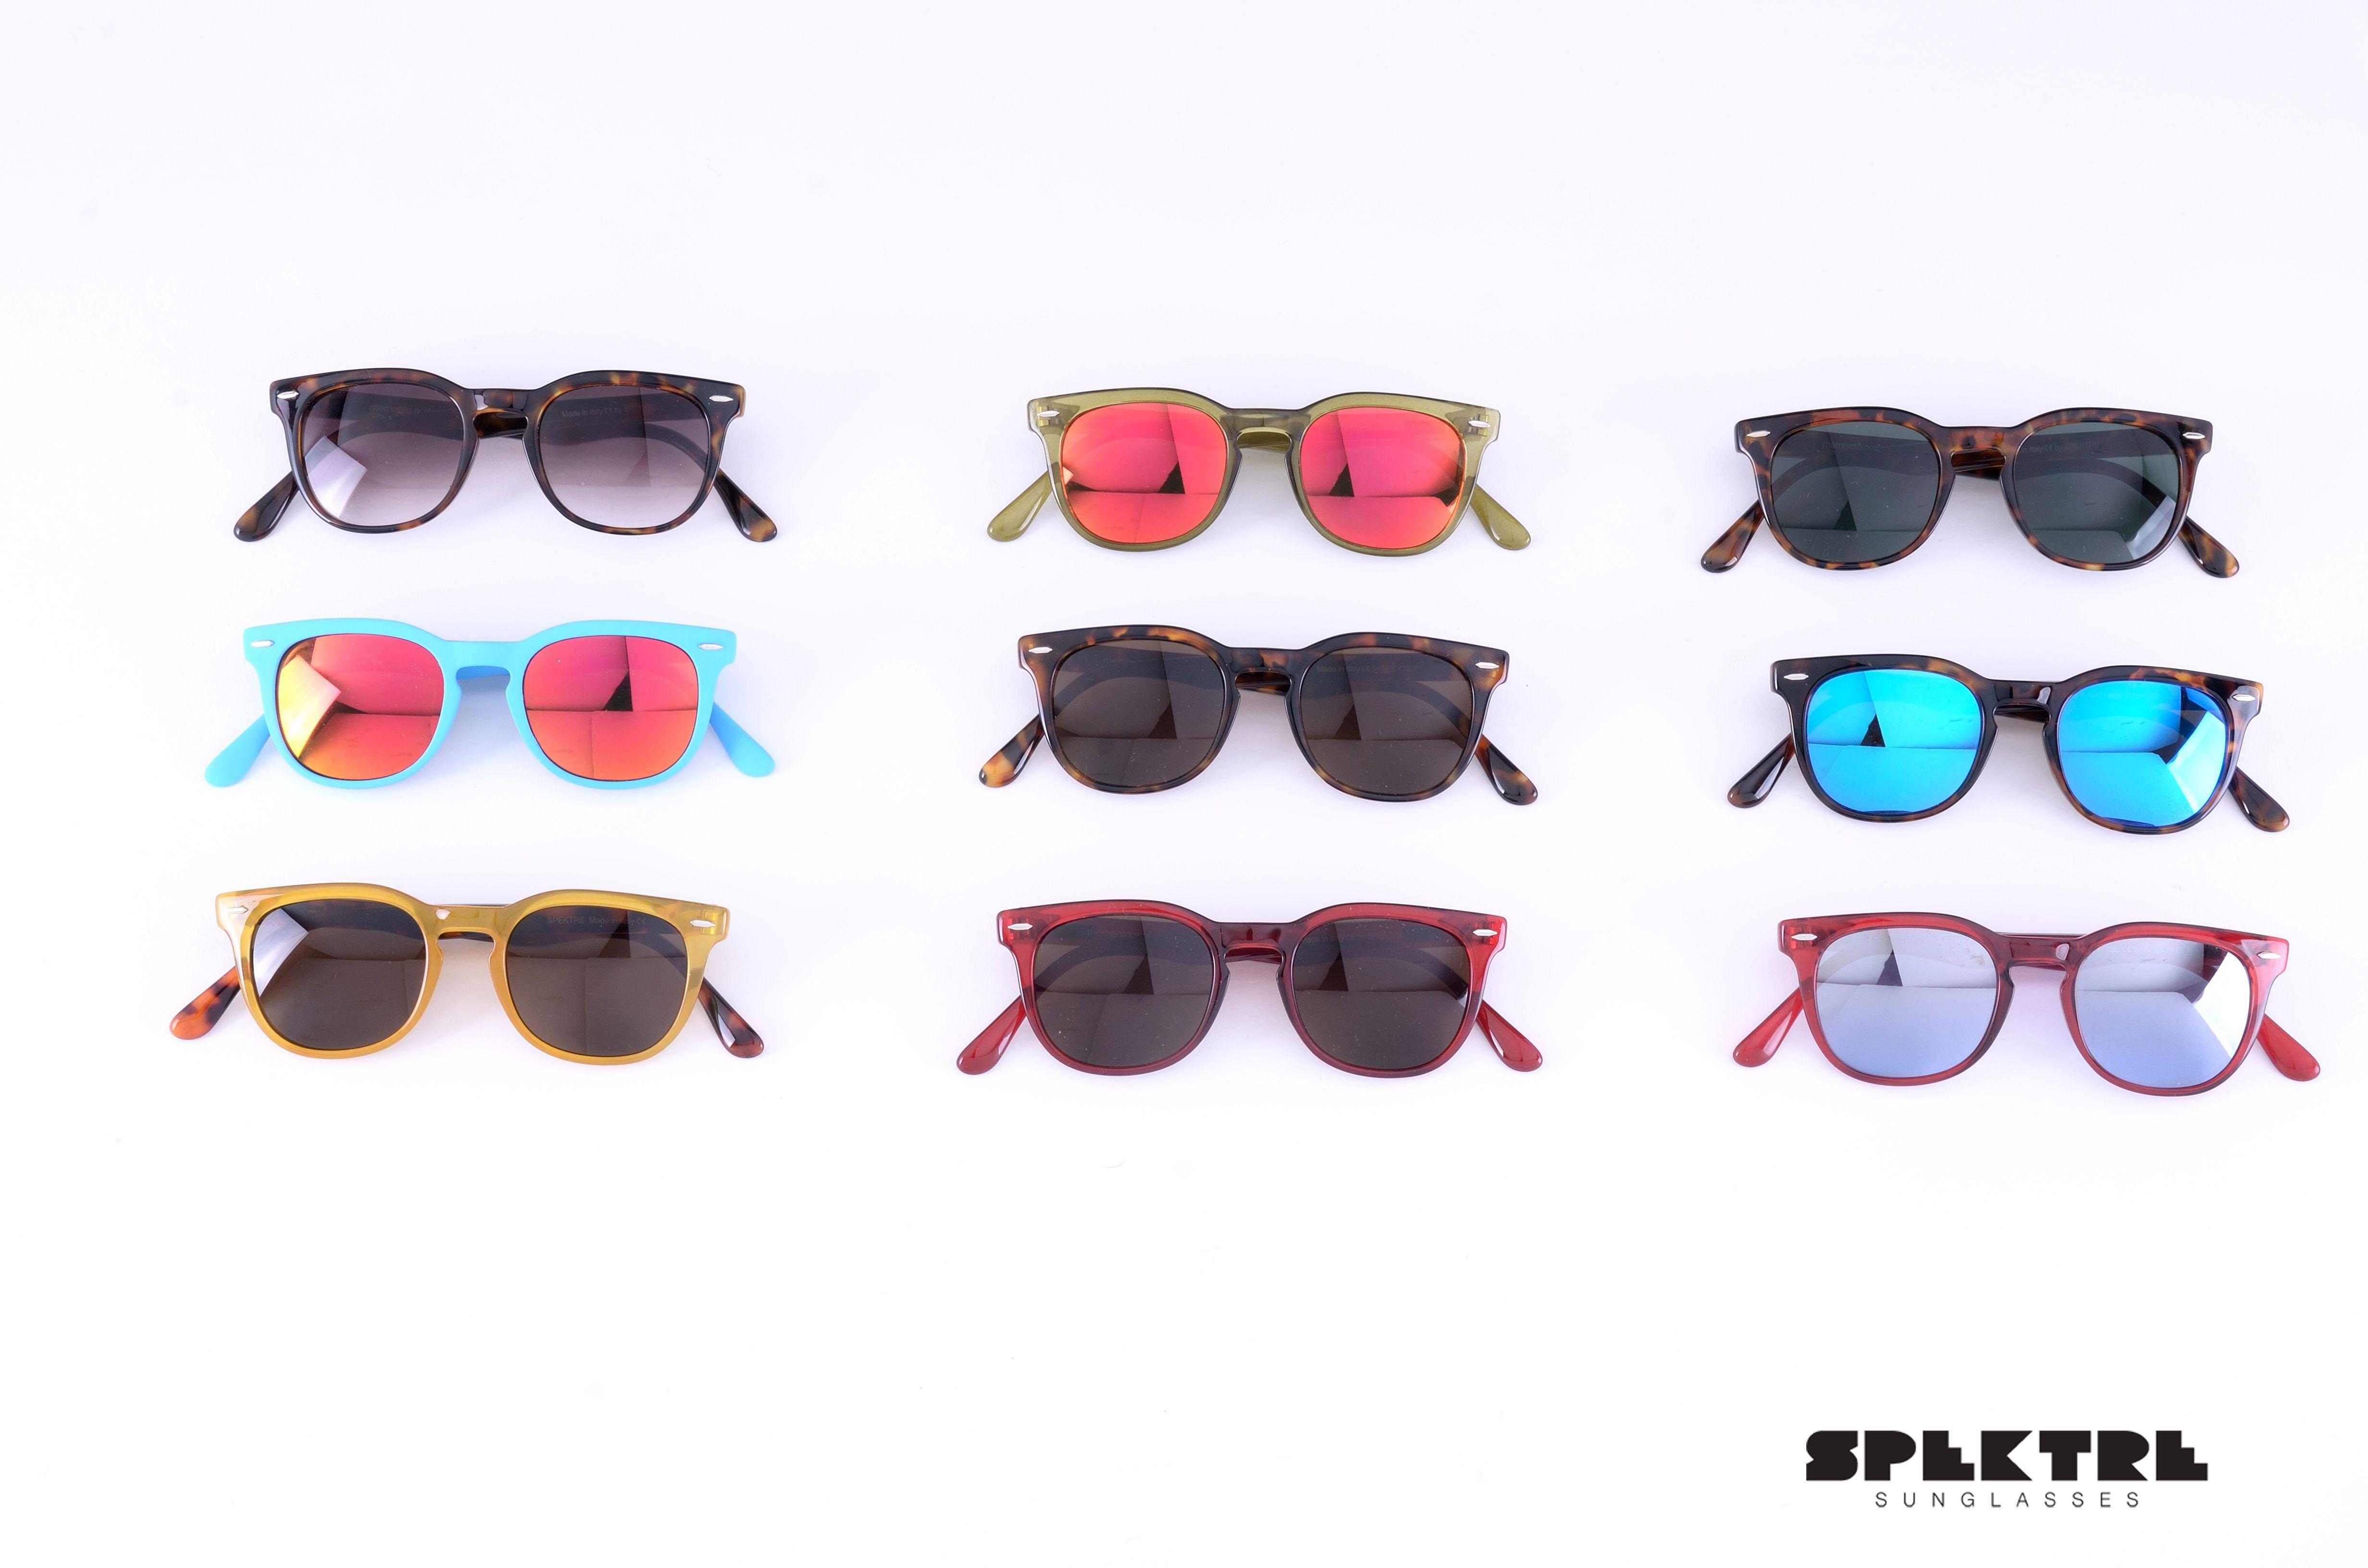 MasEyewear SunglassesFashion MasEyewear Spektre SunglassesFashion MasEyewear Spektre Spektre SunglassesFashion Spektre lK1FJTc3